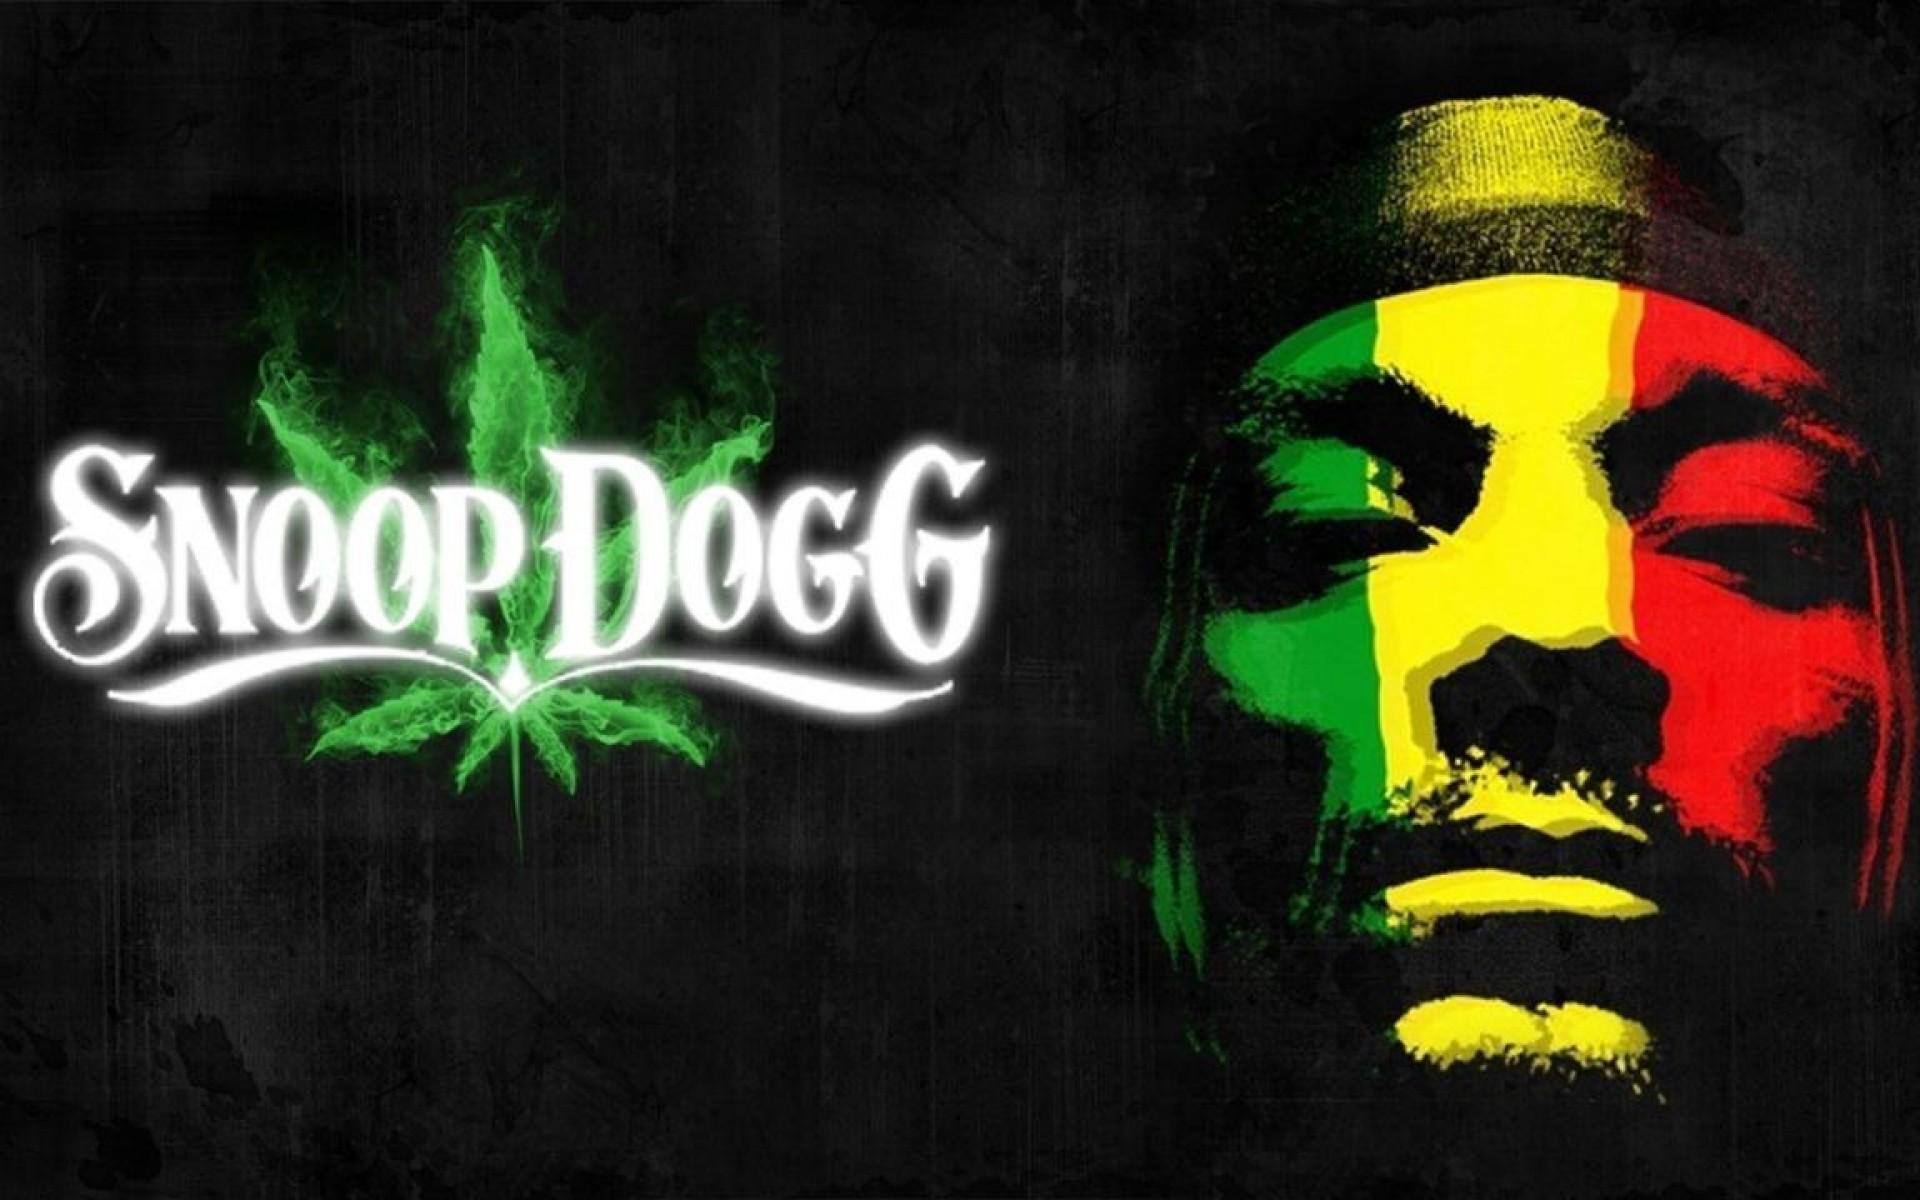 marijuana weed 420 ganja snoop snoop dogg psychedelic f